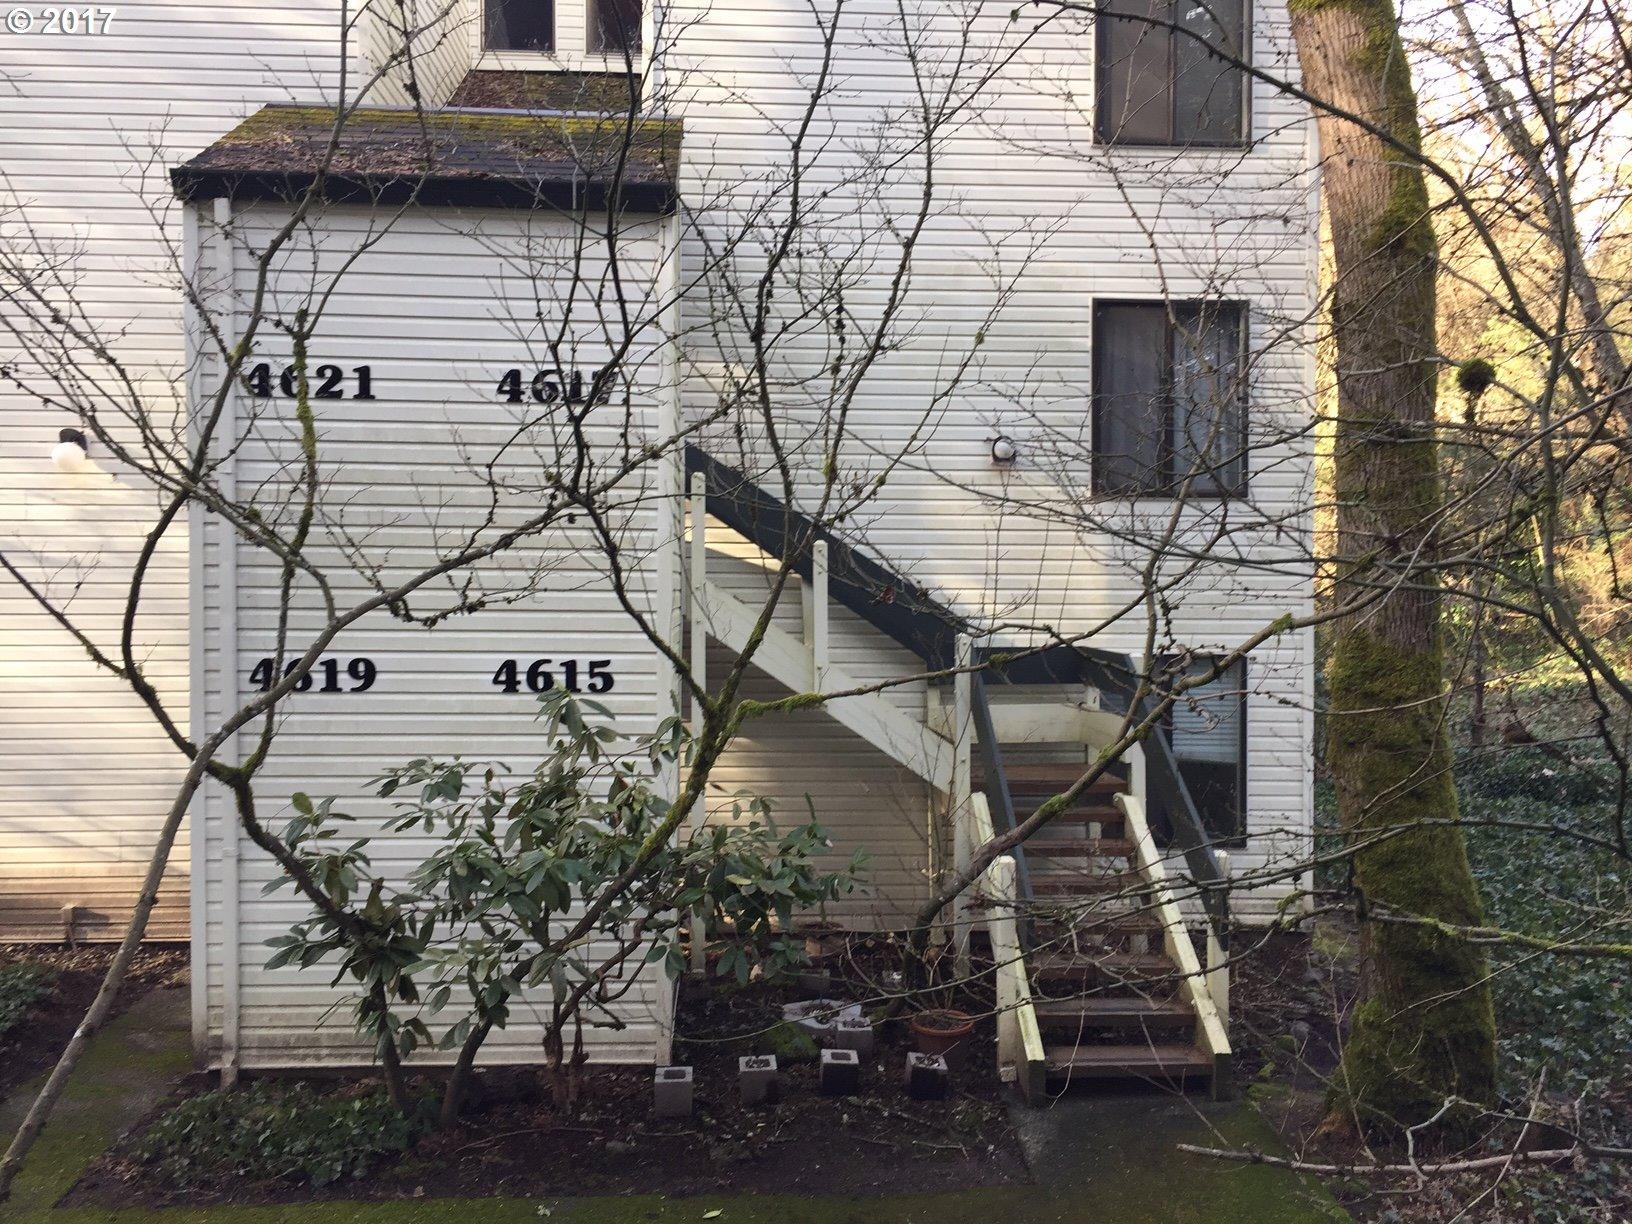 4615 LAKEVIEW BLVD, Lake Oswego, OR 97035